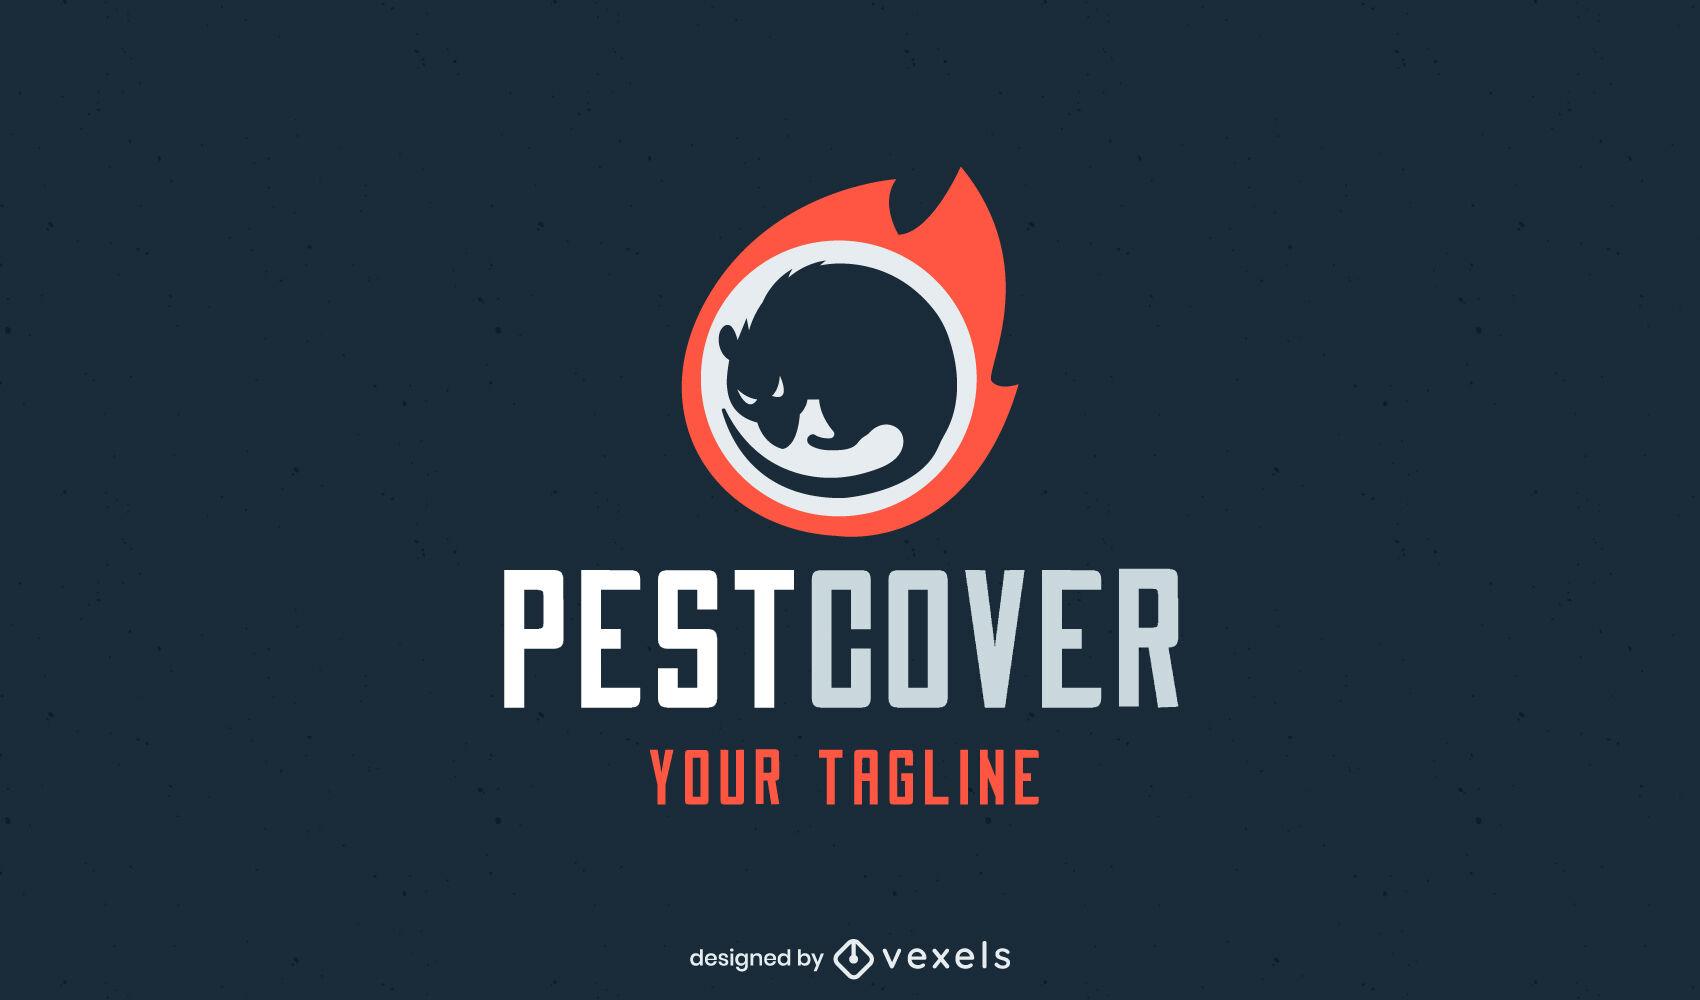 Rat on fire pest control logo template